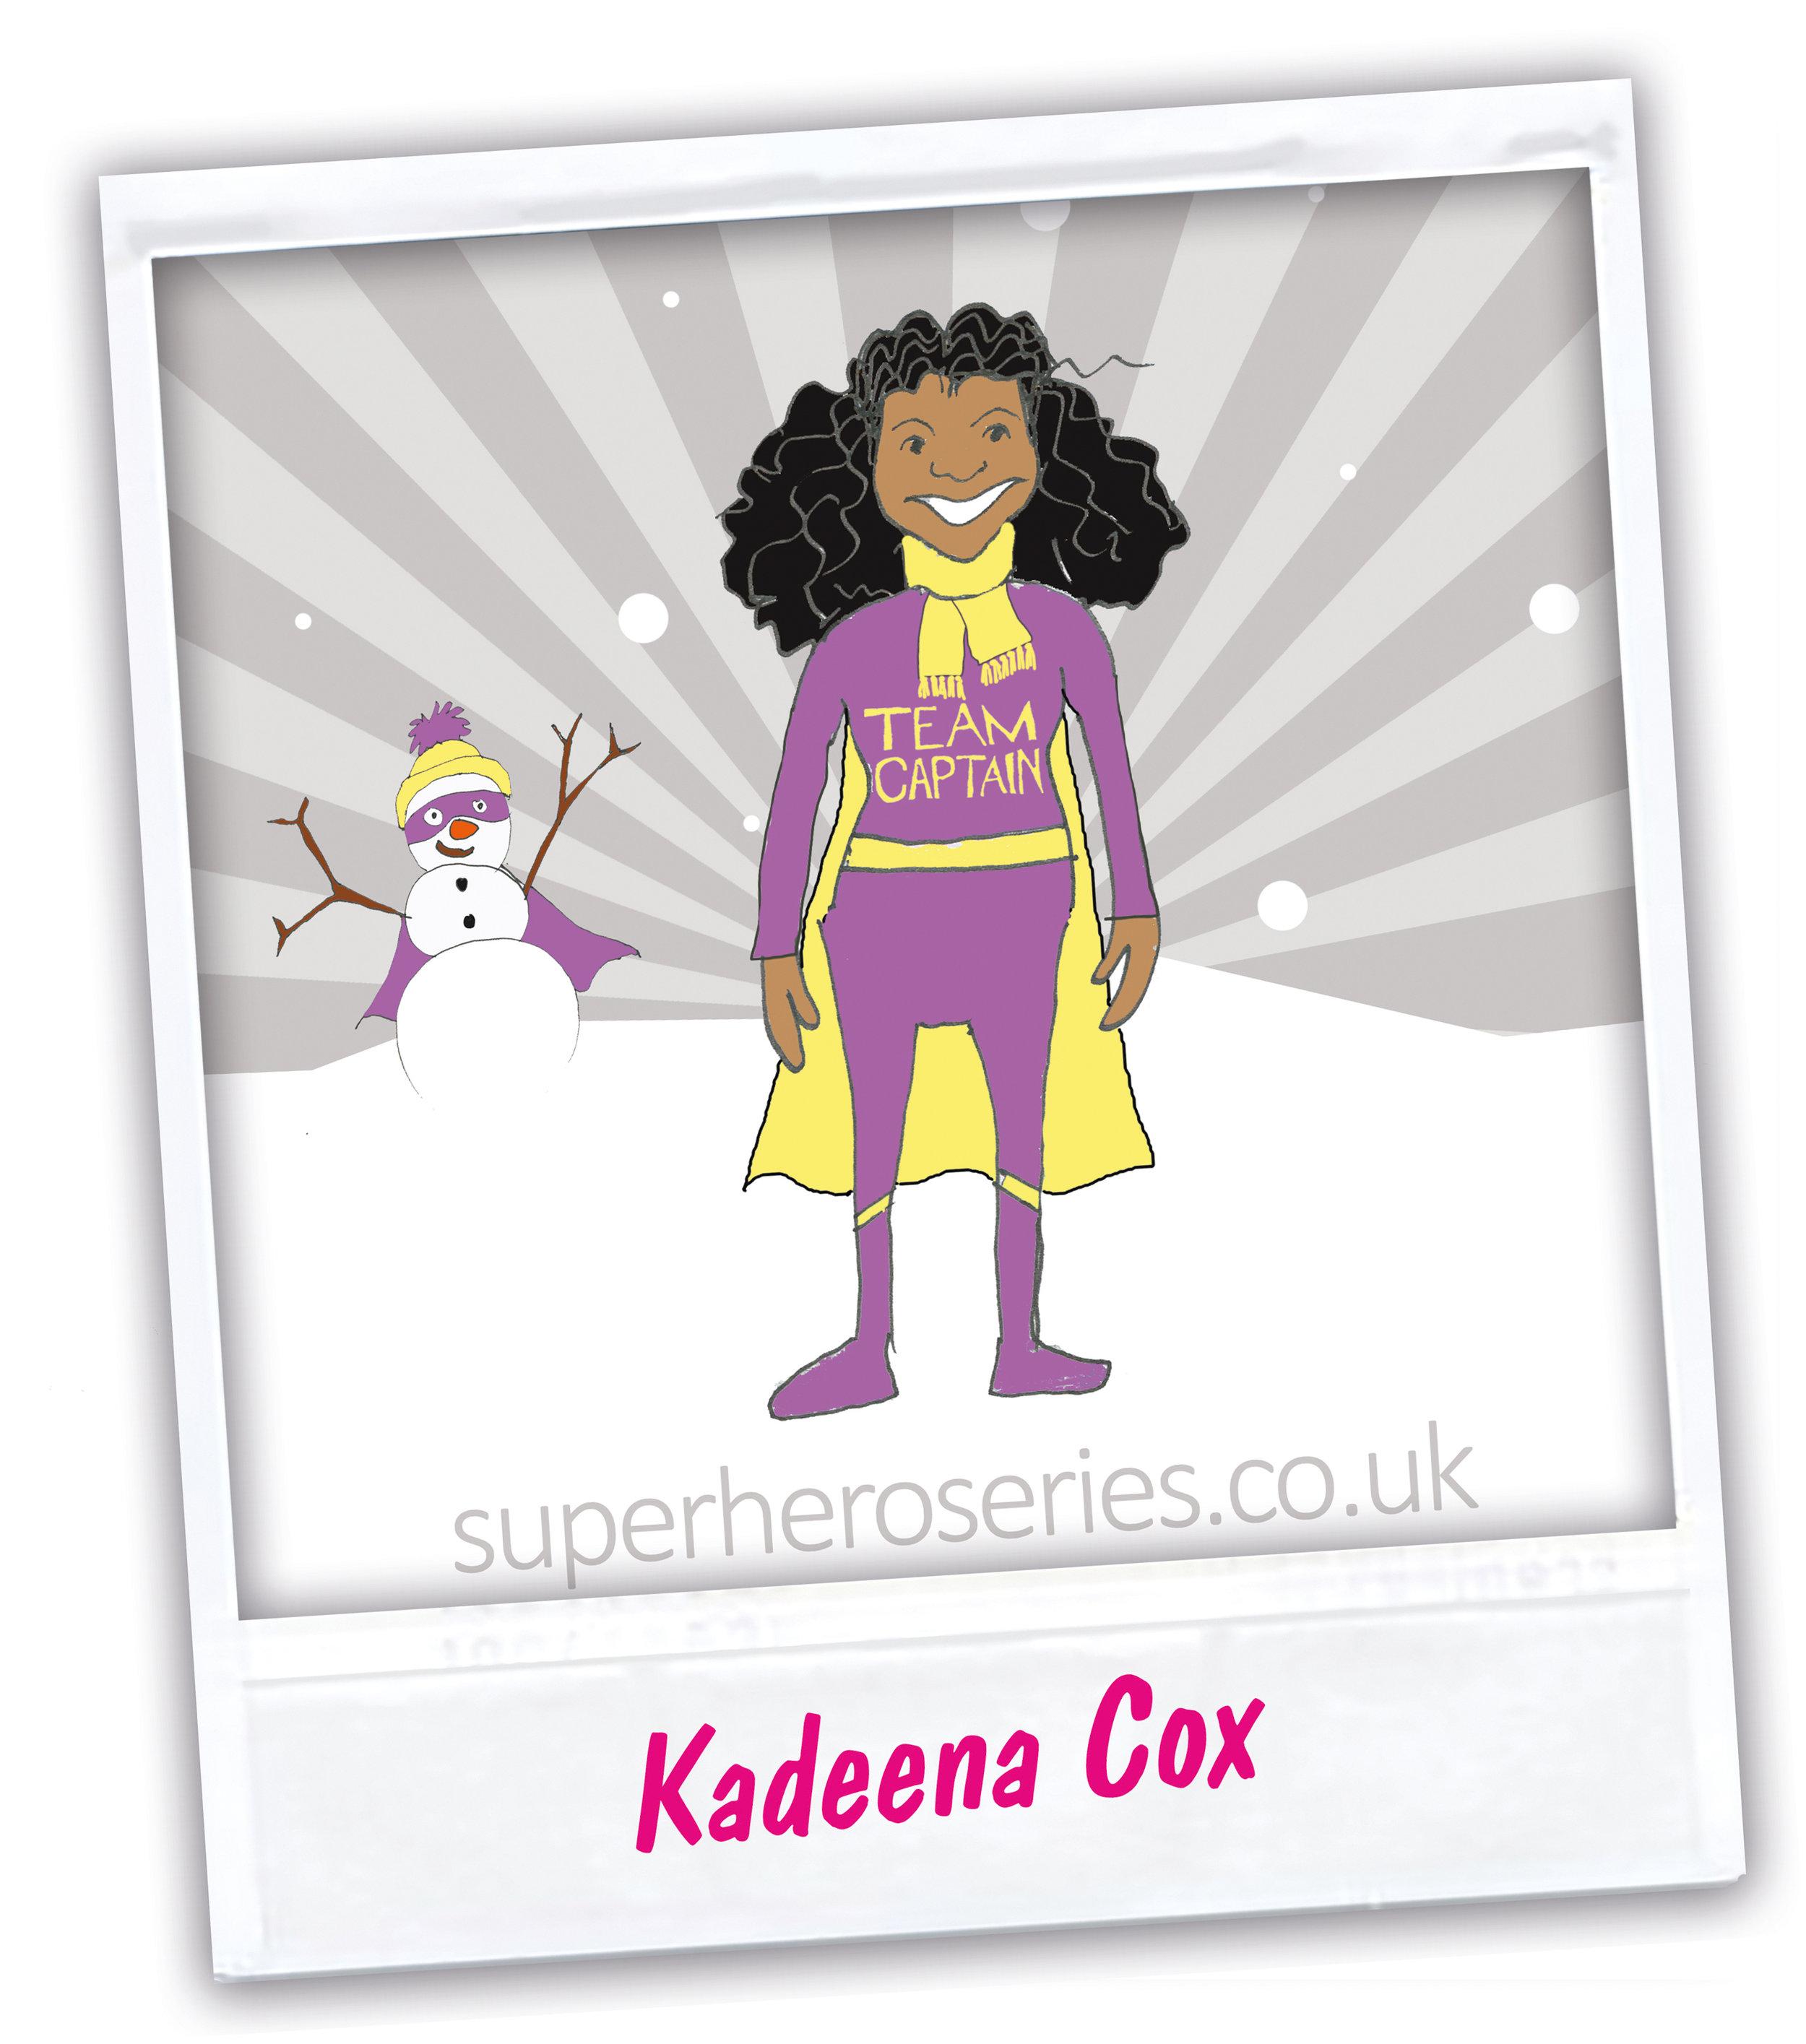 Kadeena Cox b.jpg